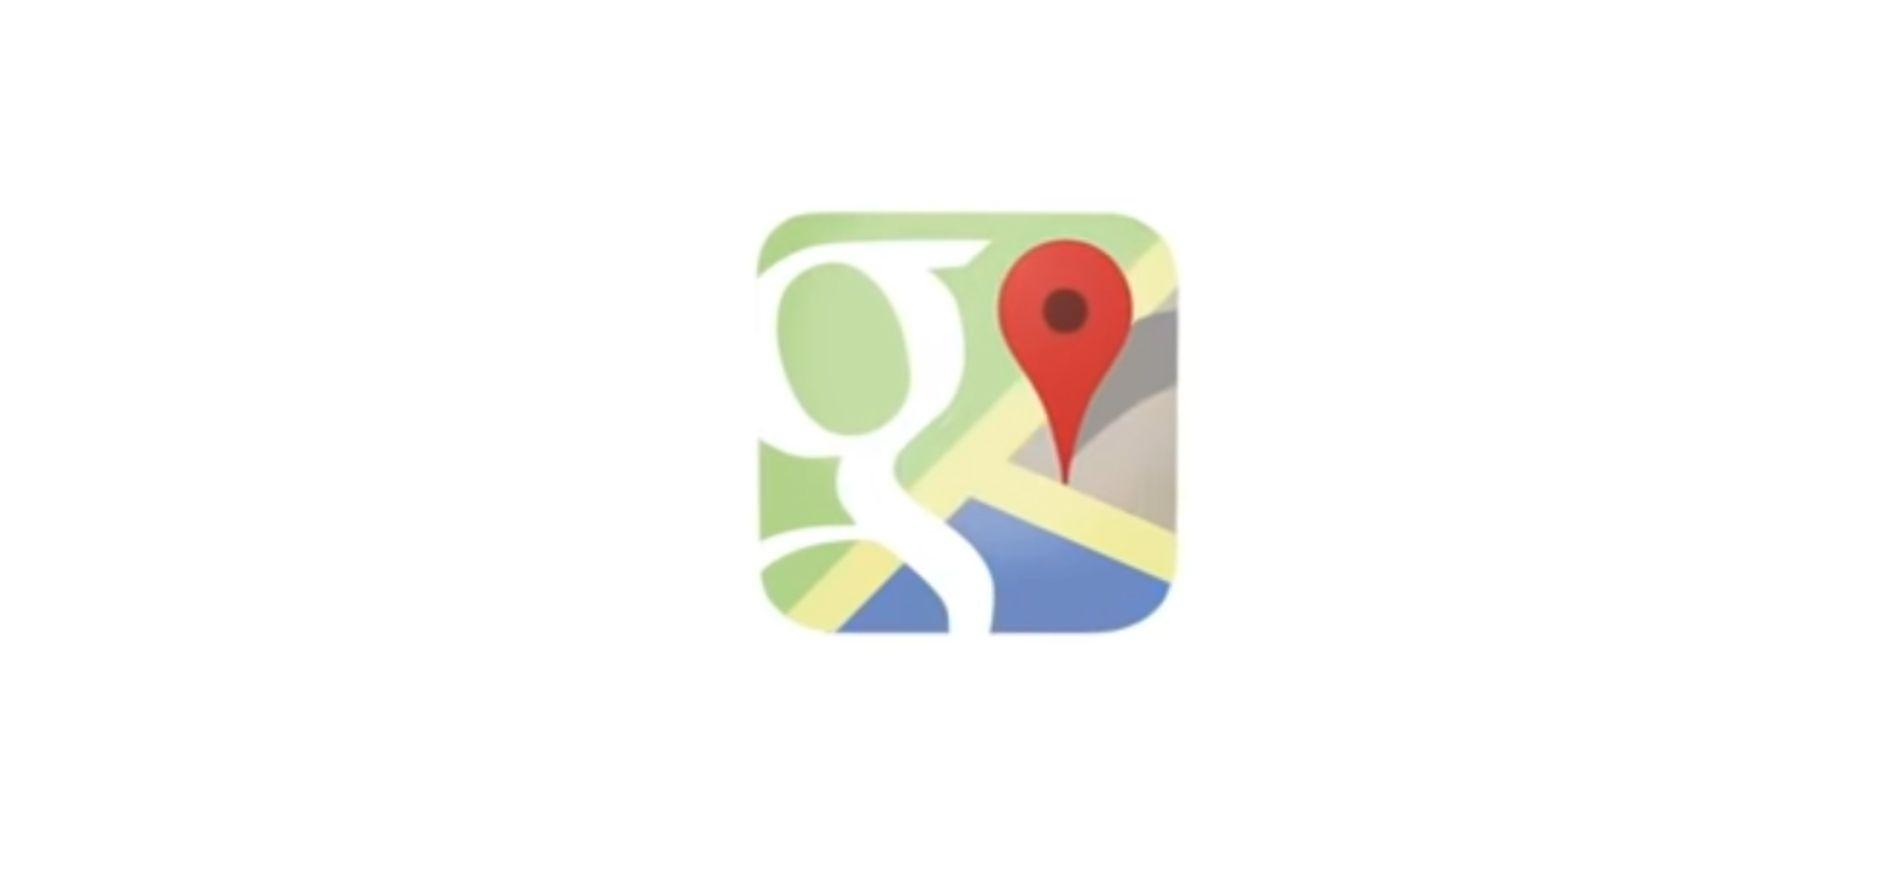 google maps logo6